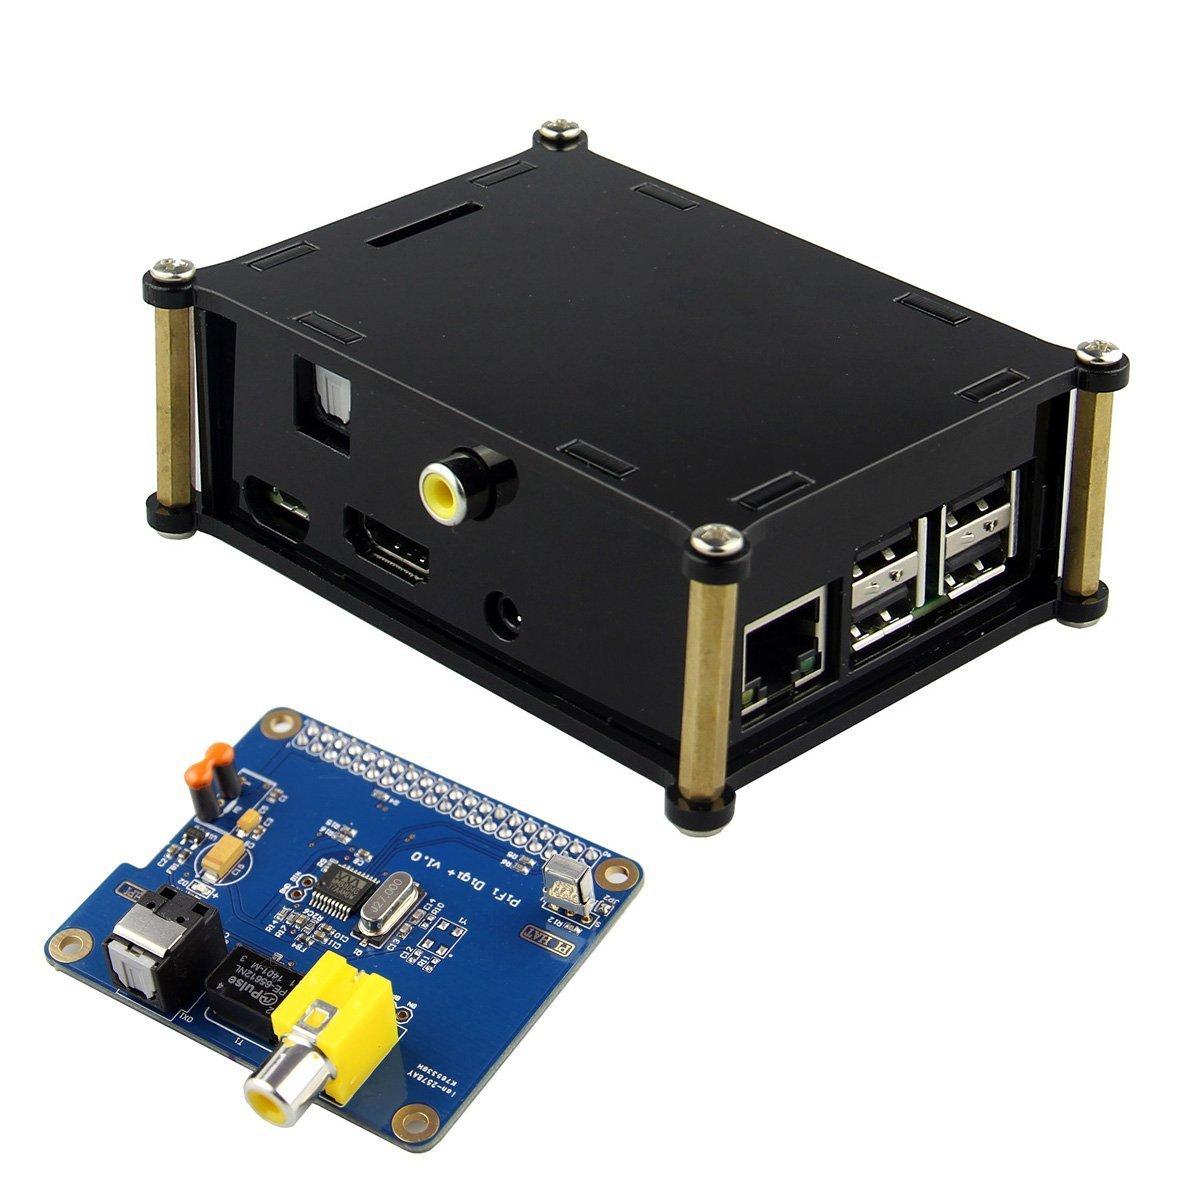 2017 05 512 xd picture card - Kuman For Raspberry Pi Hifi Digi Digital Sound Card I2s Spdif Optical Fiber Protective Acrylic